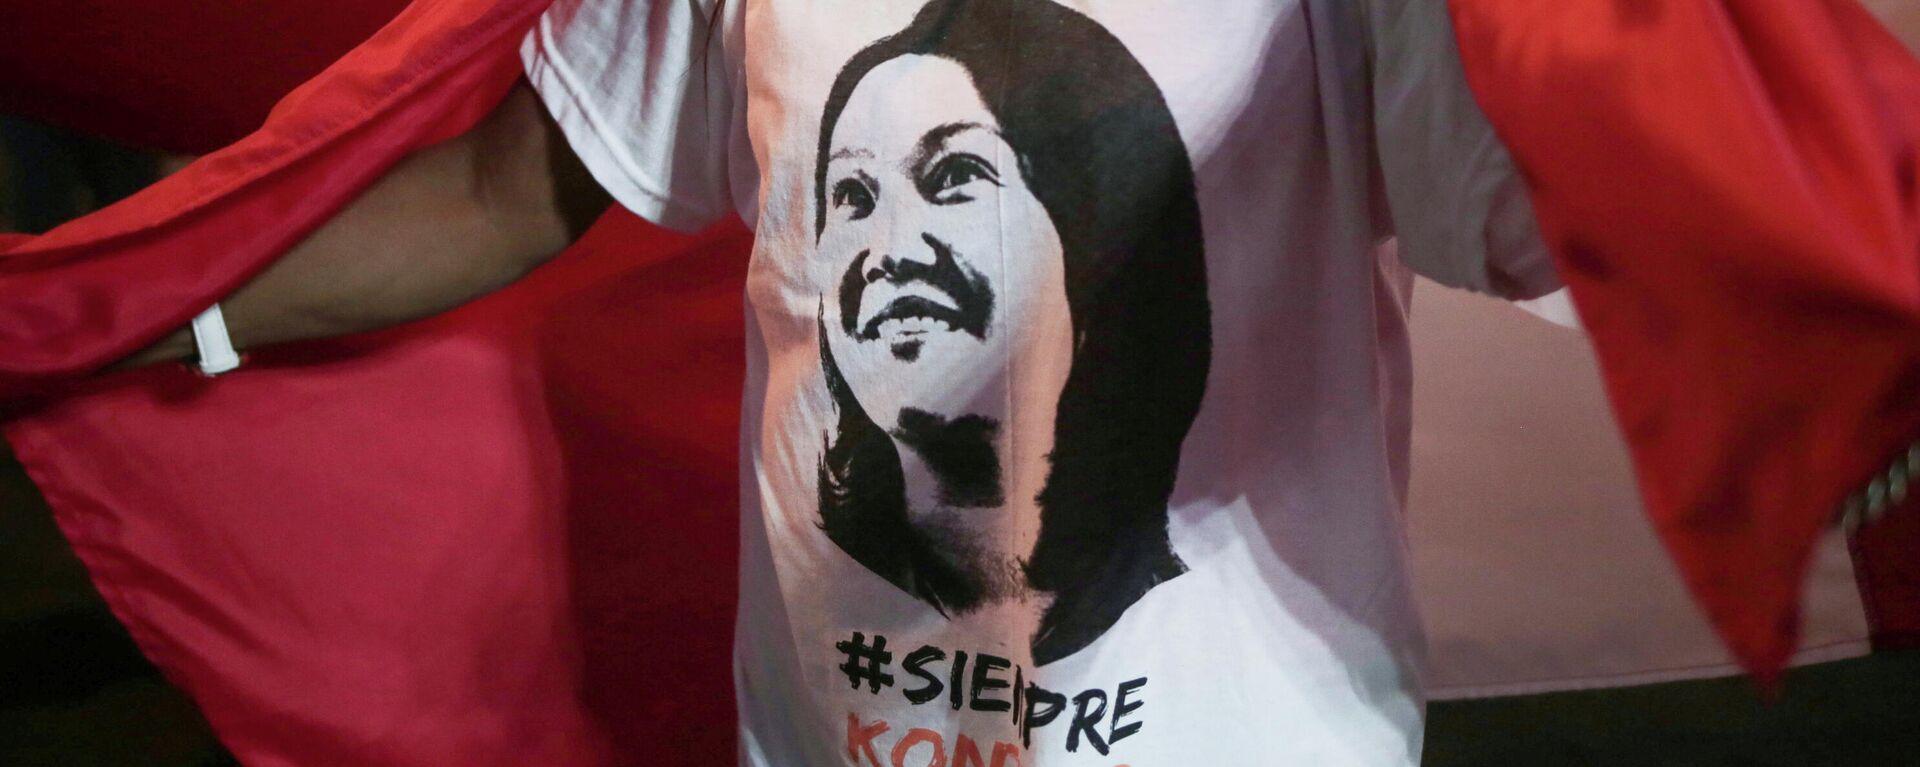 Partidaria de la candidata a la presidencia de Perú, Keiko Fujimori - Sputnik Mundo, 1920, 29.06.2021